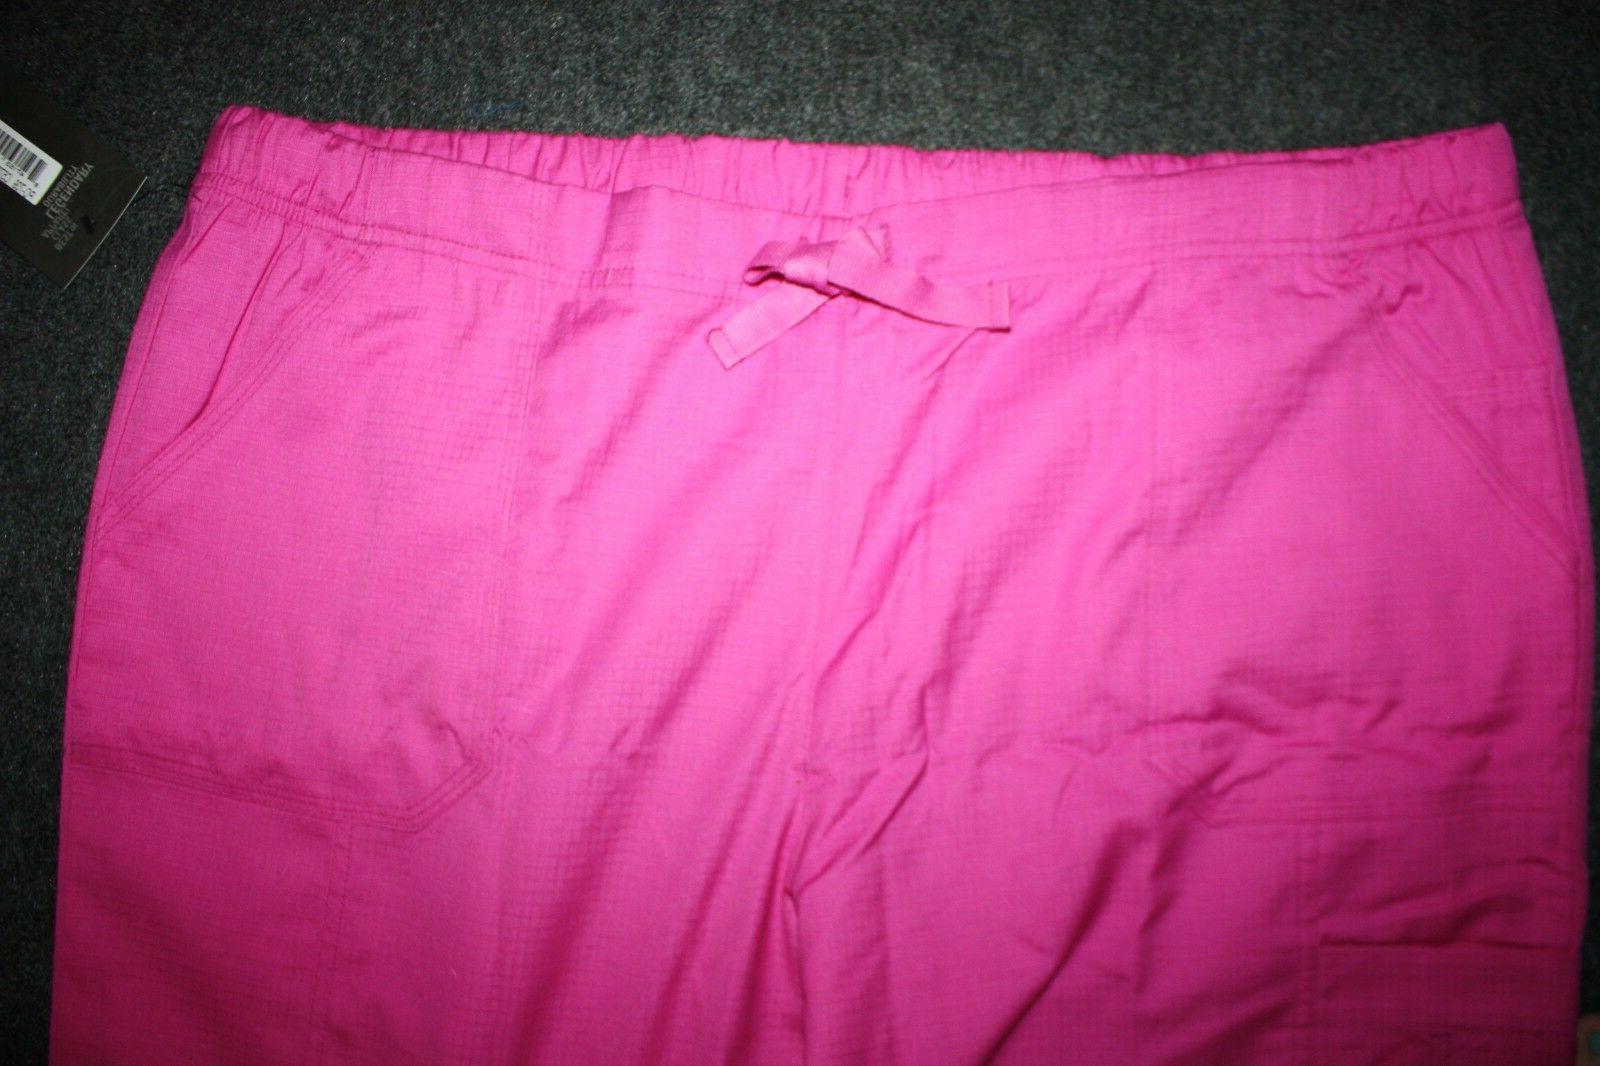 Carhartt Set Ripstop 2 Pink Plus